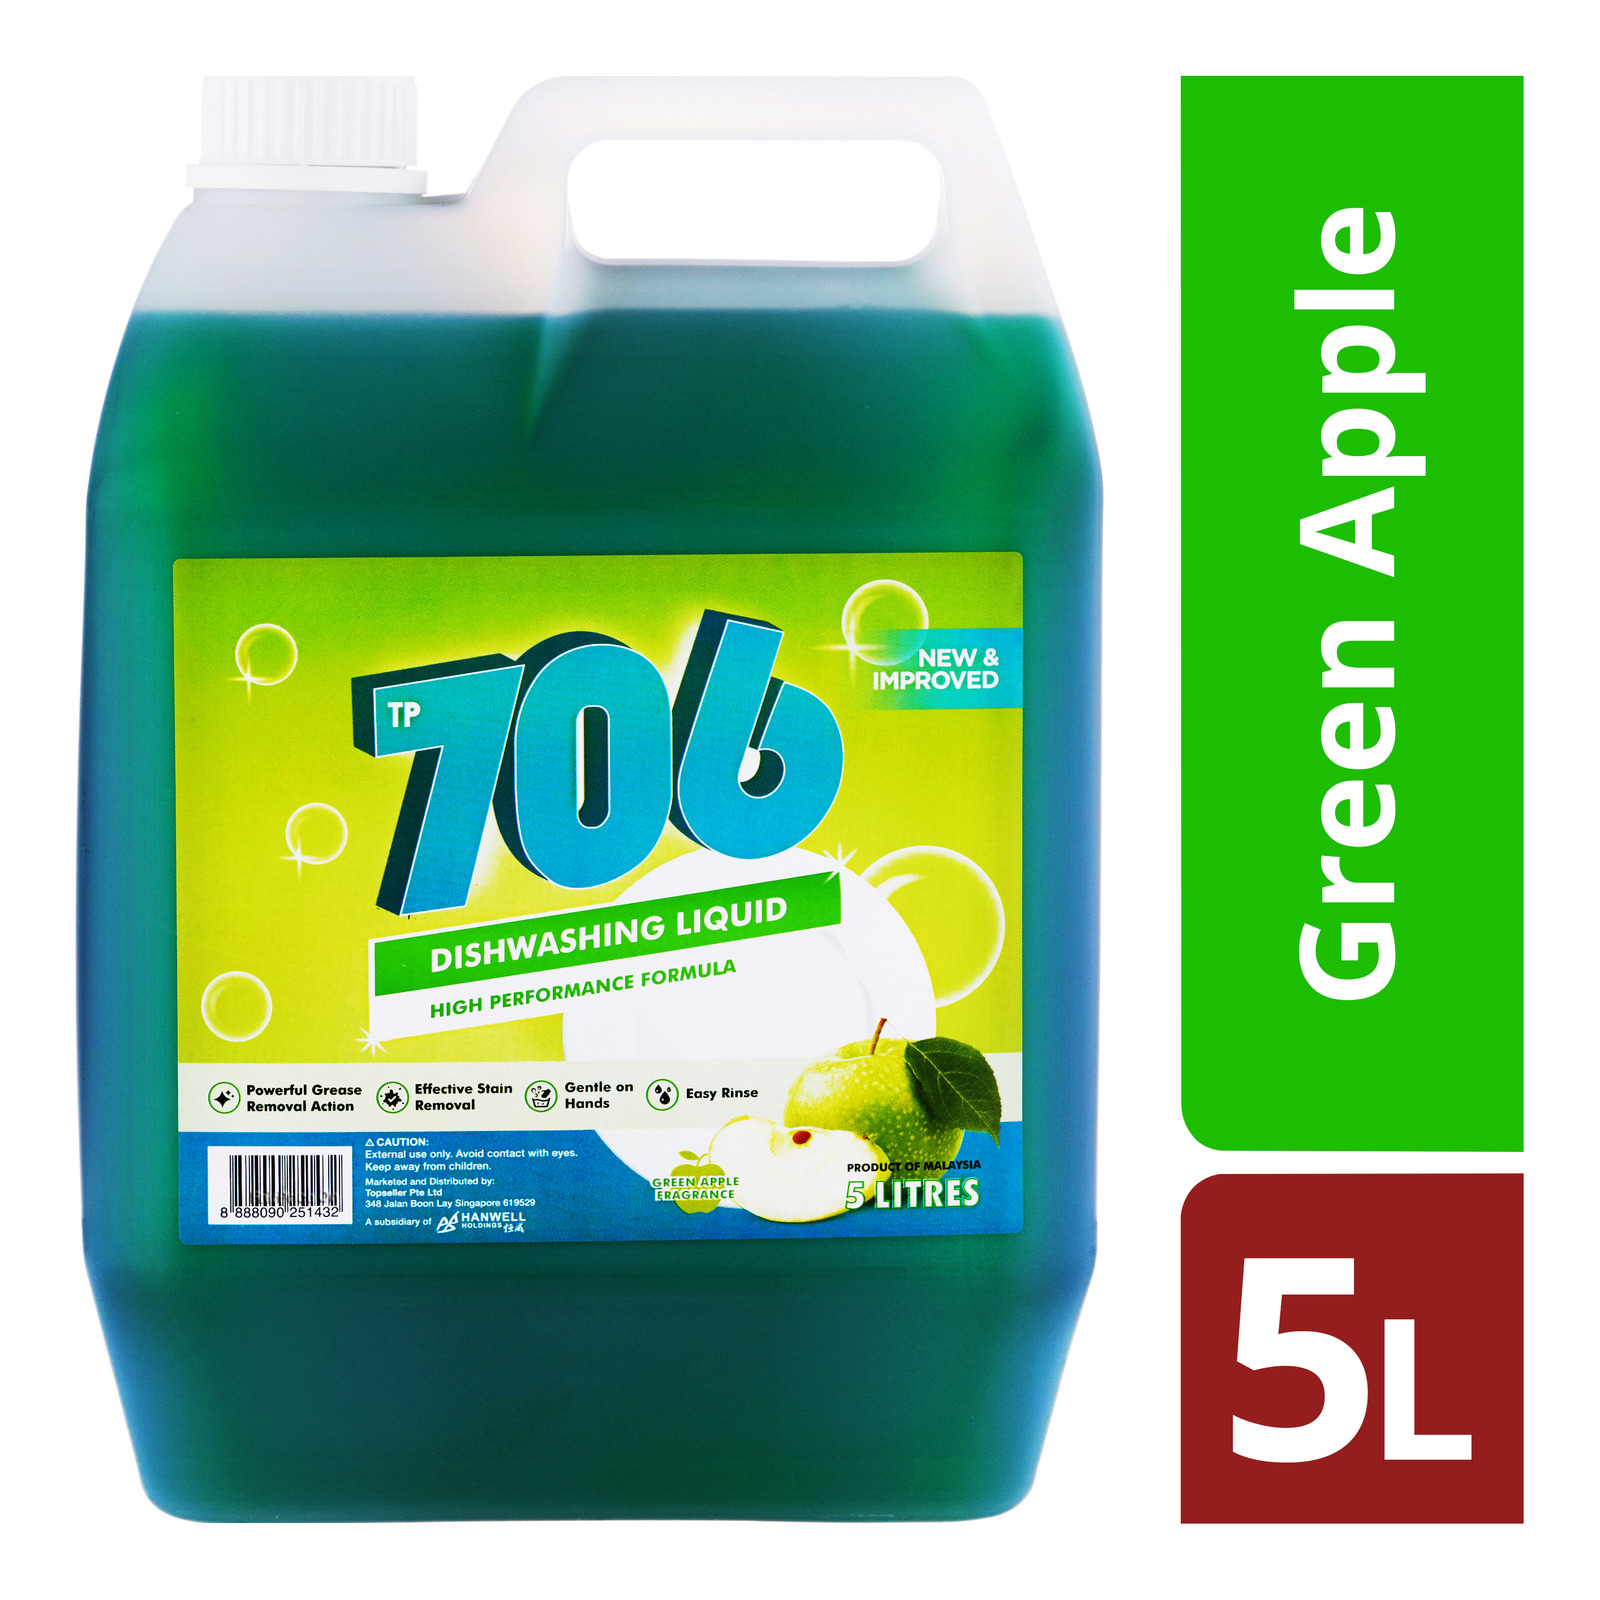 TP 706 Dishwashing Liquid - Green Apple